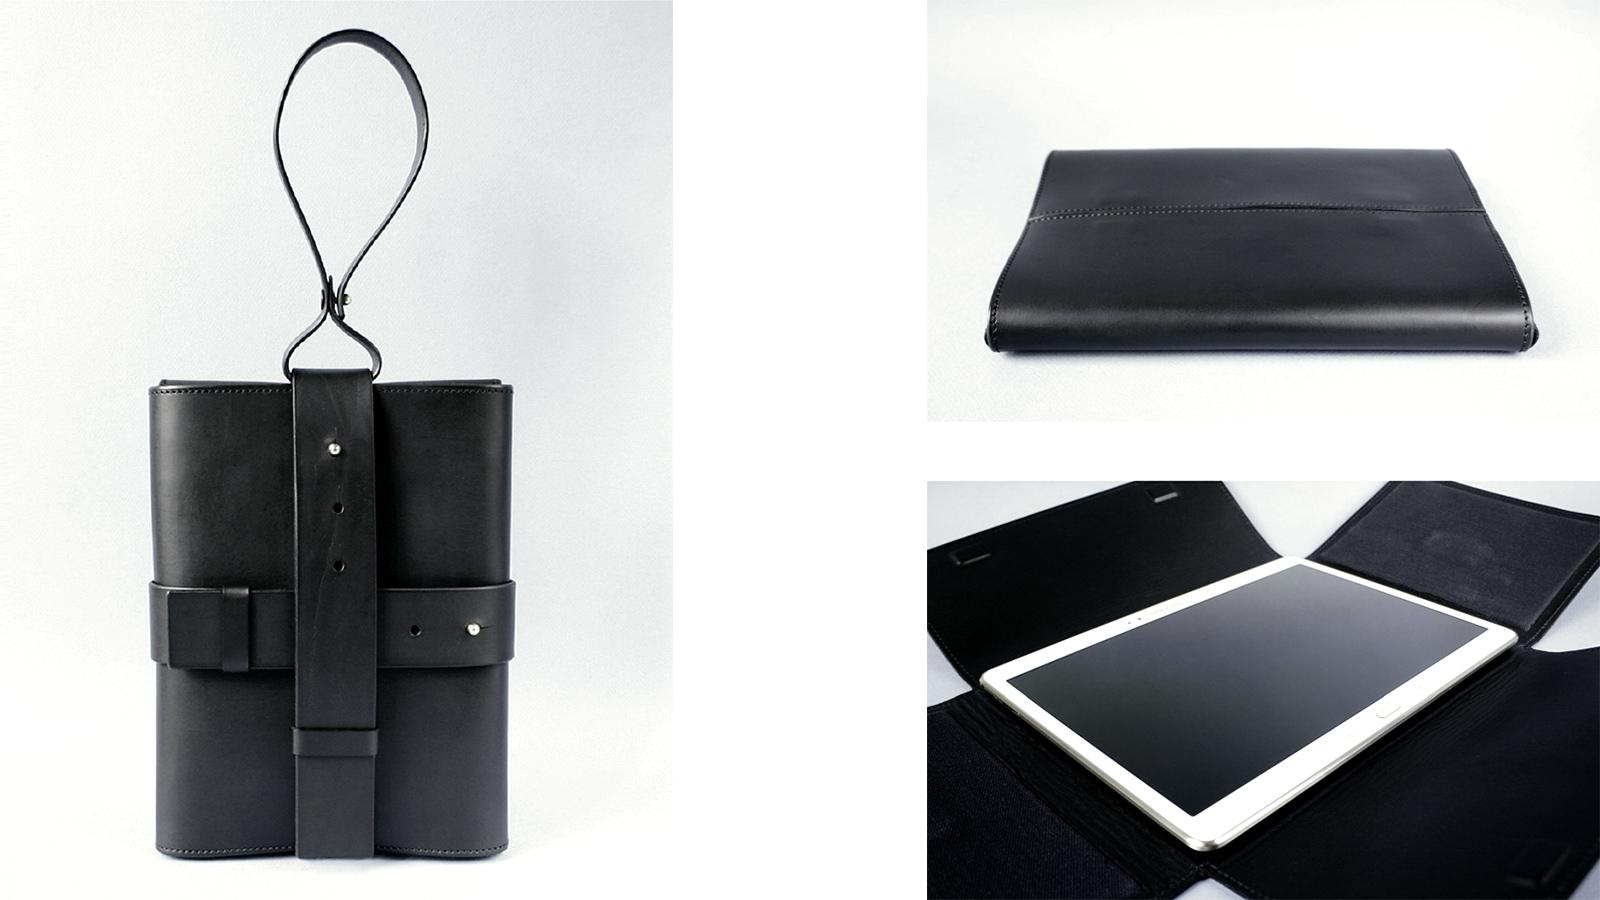 Mirja Pitkäärt: Samsung Galaxy Tab S Sleeve, 2014